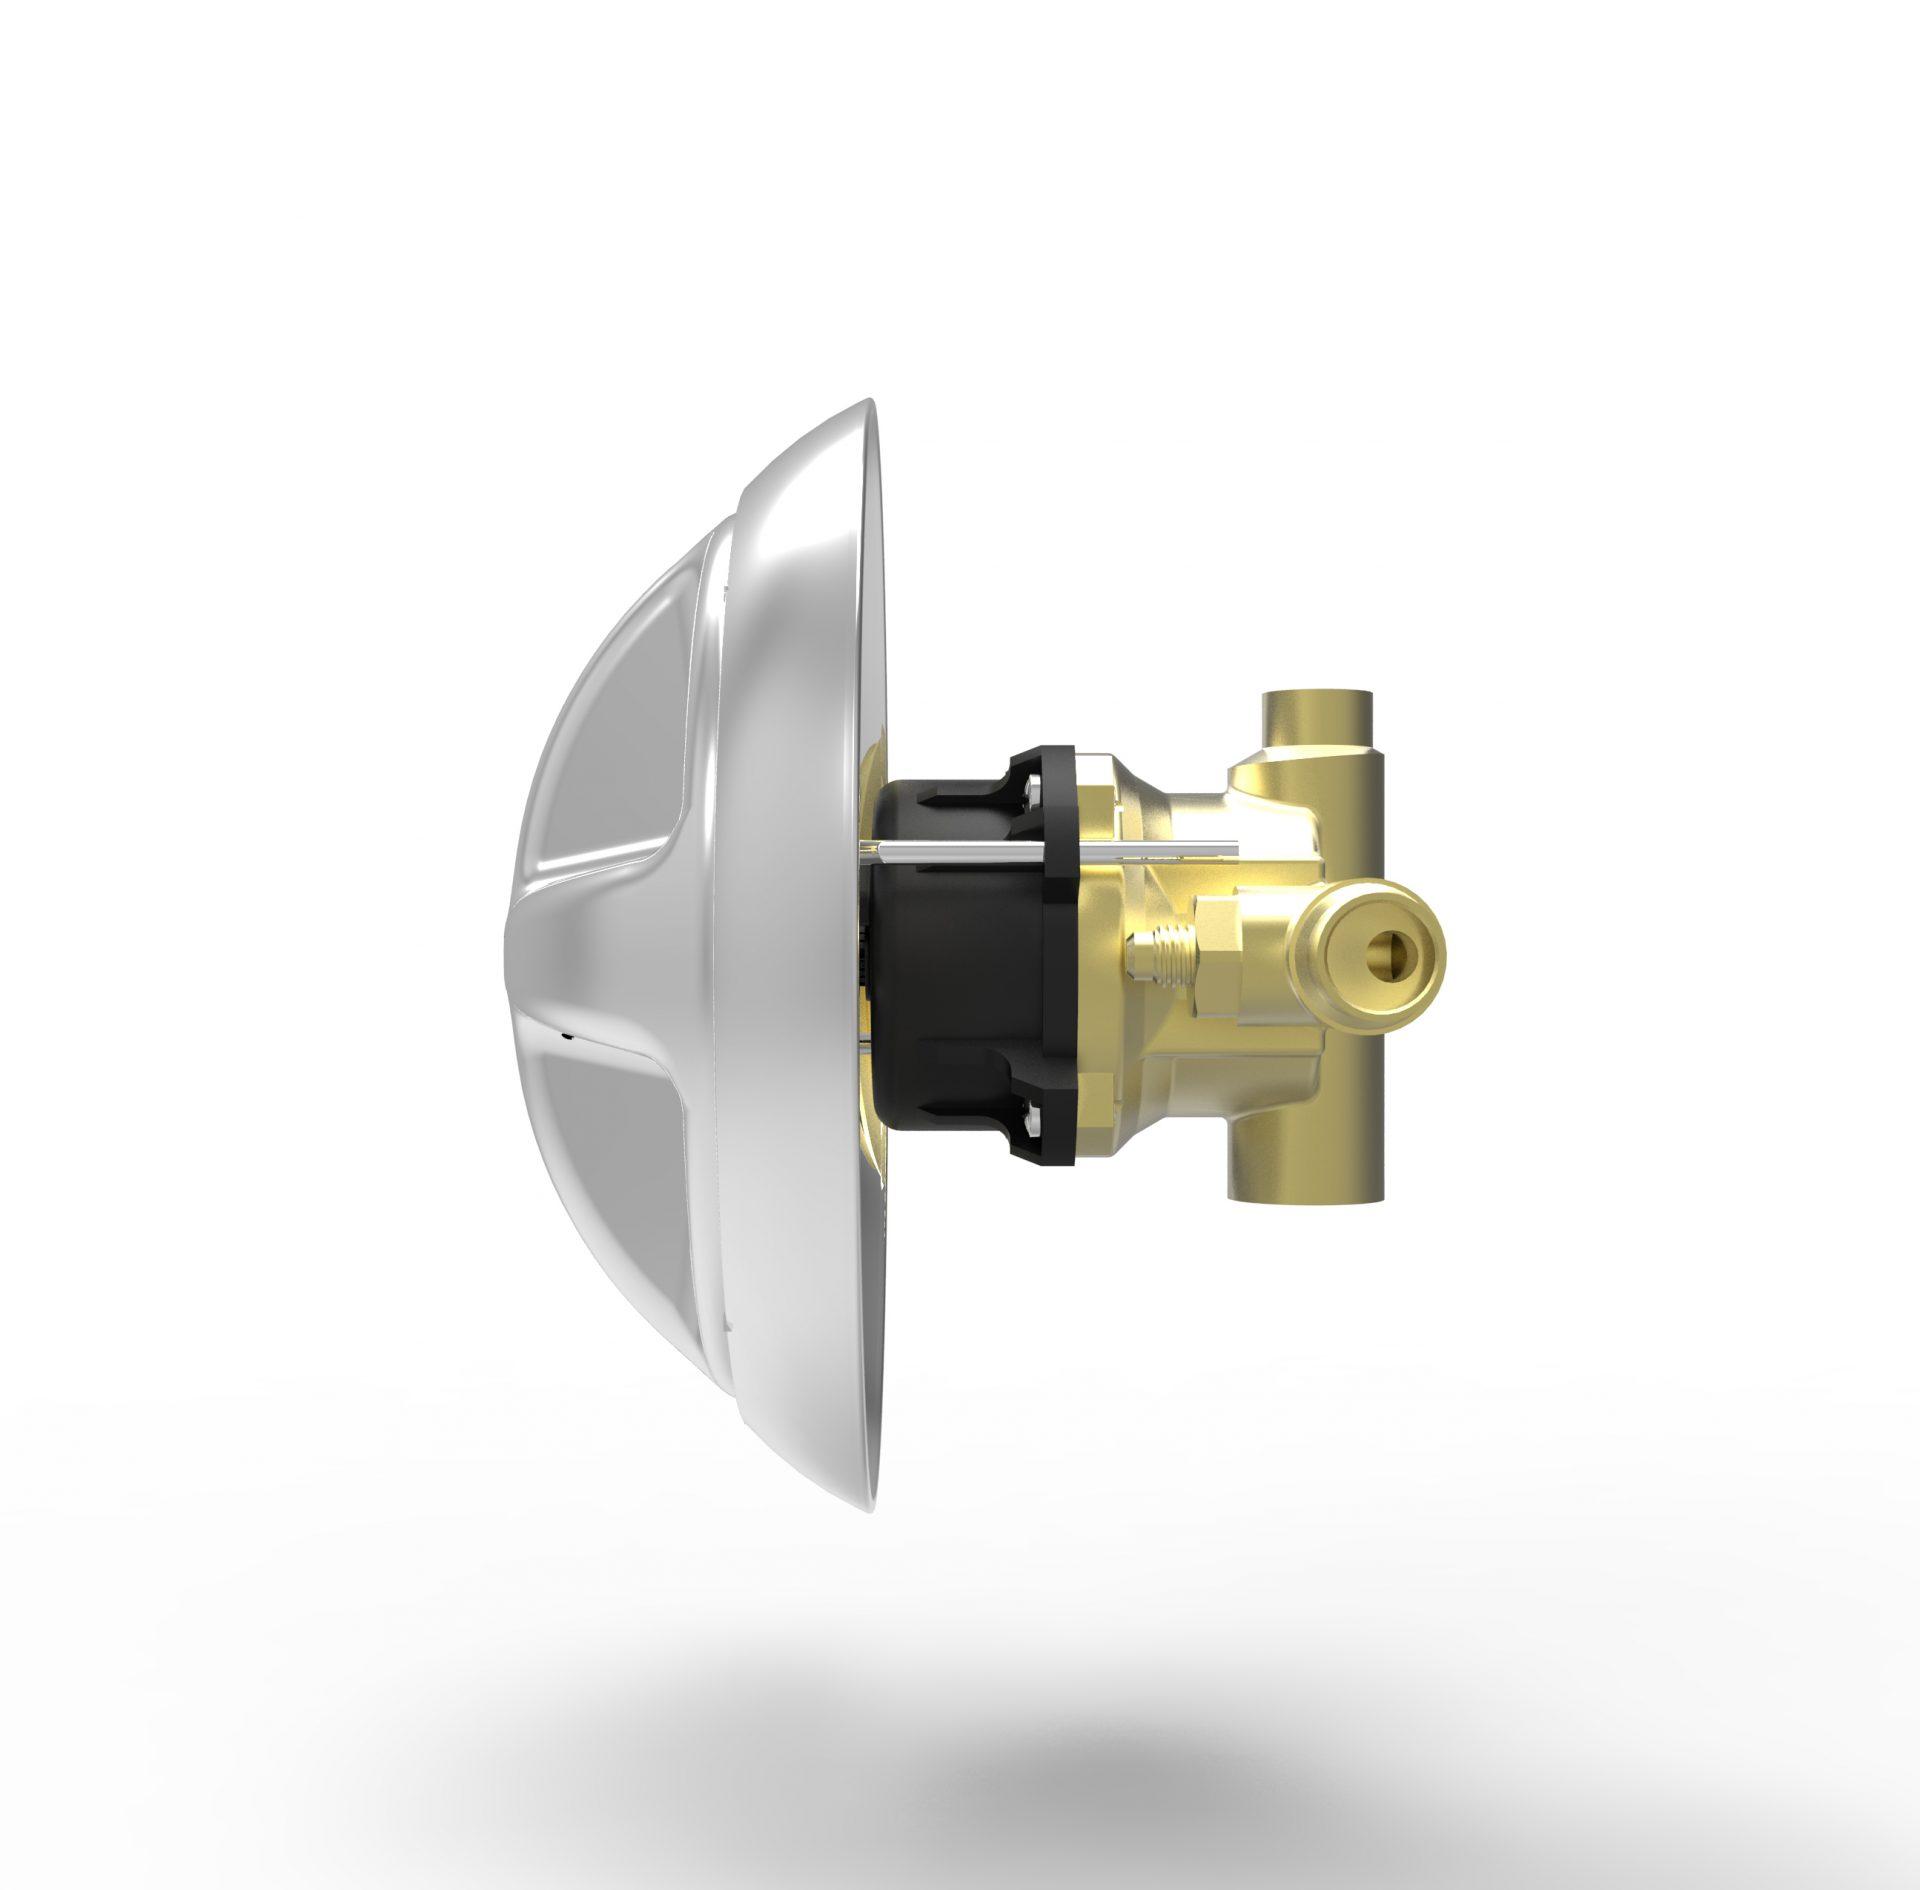 Ligature Resistant Shower Valve, Handle, & Escutcheon Plate Side Angle